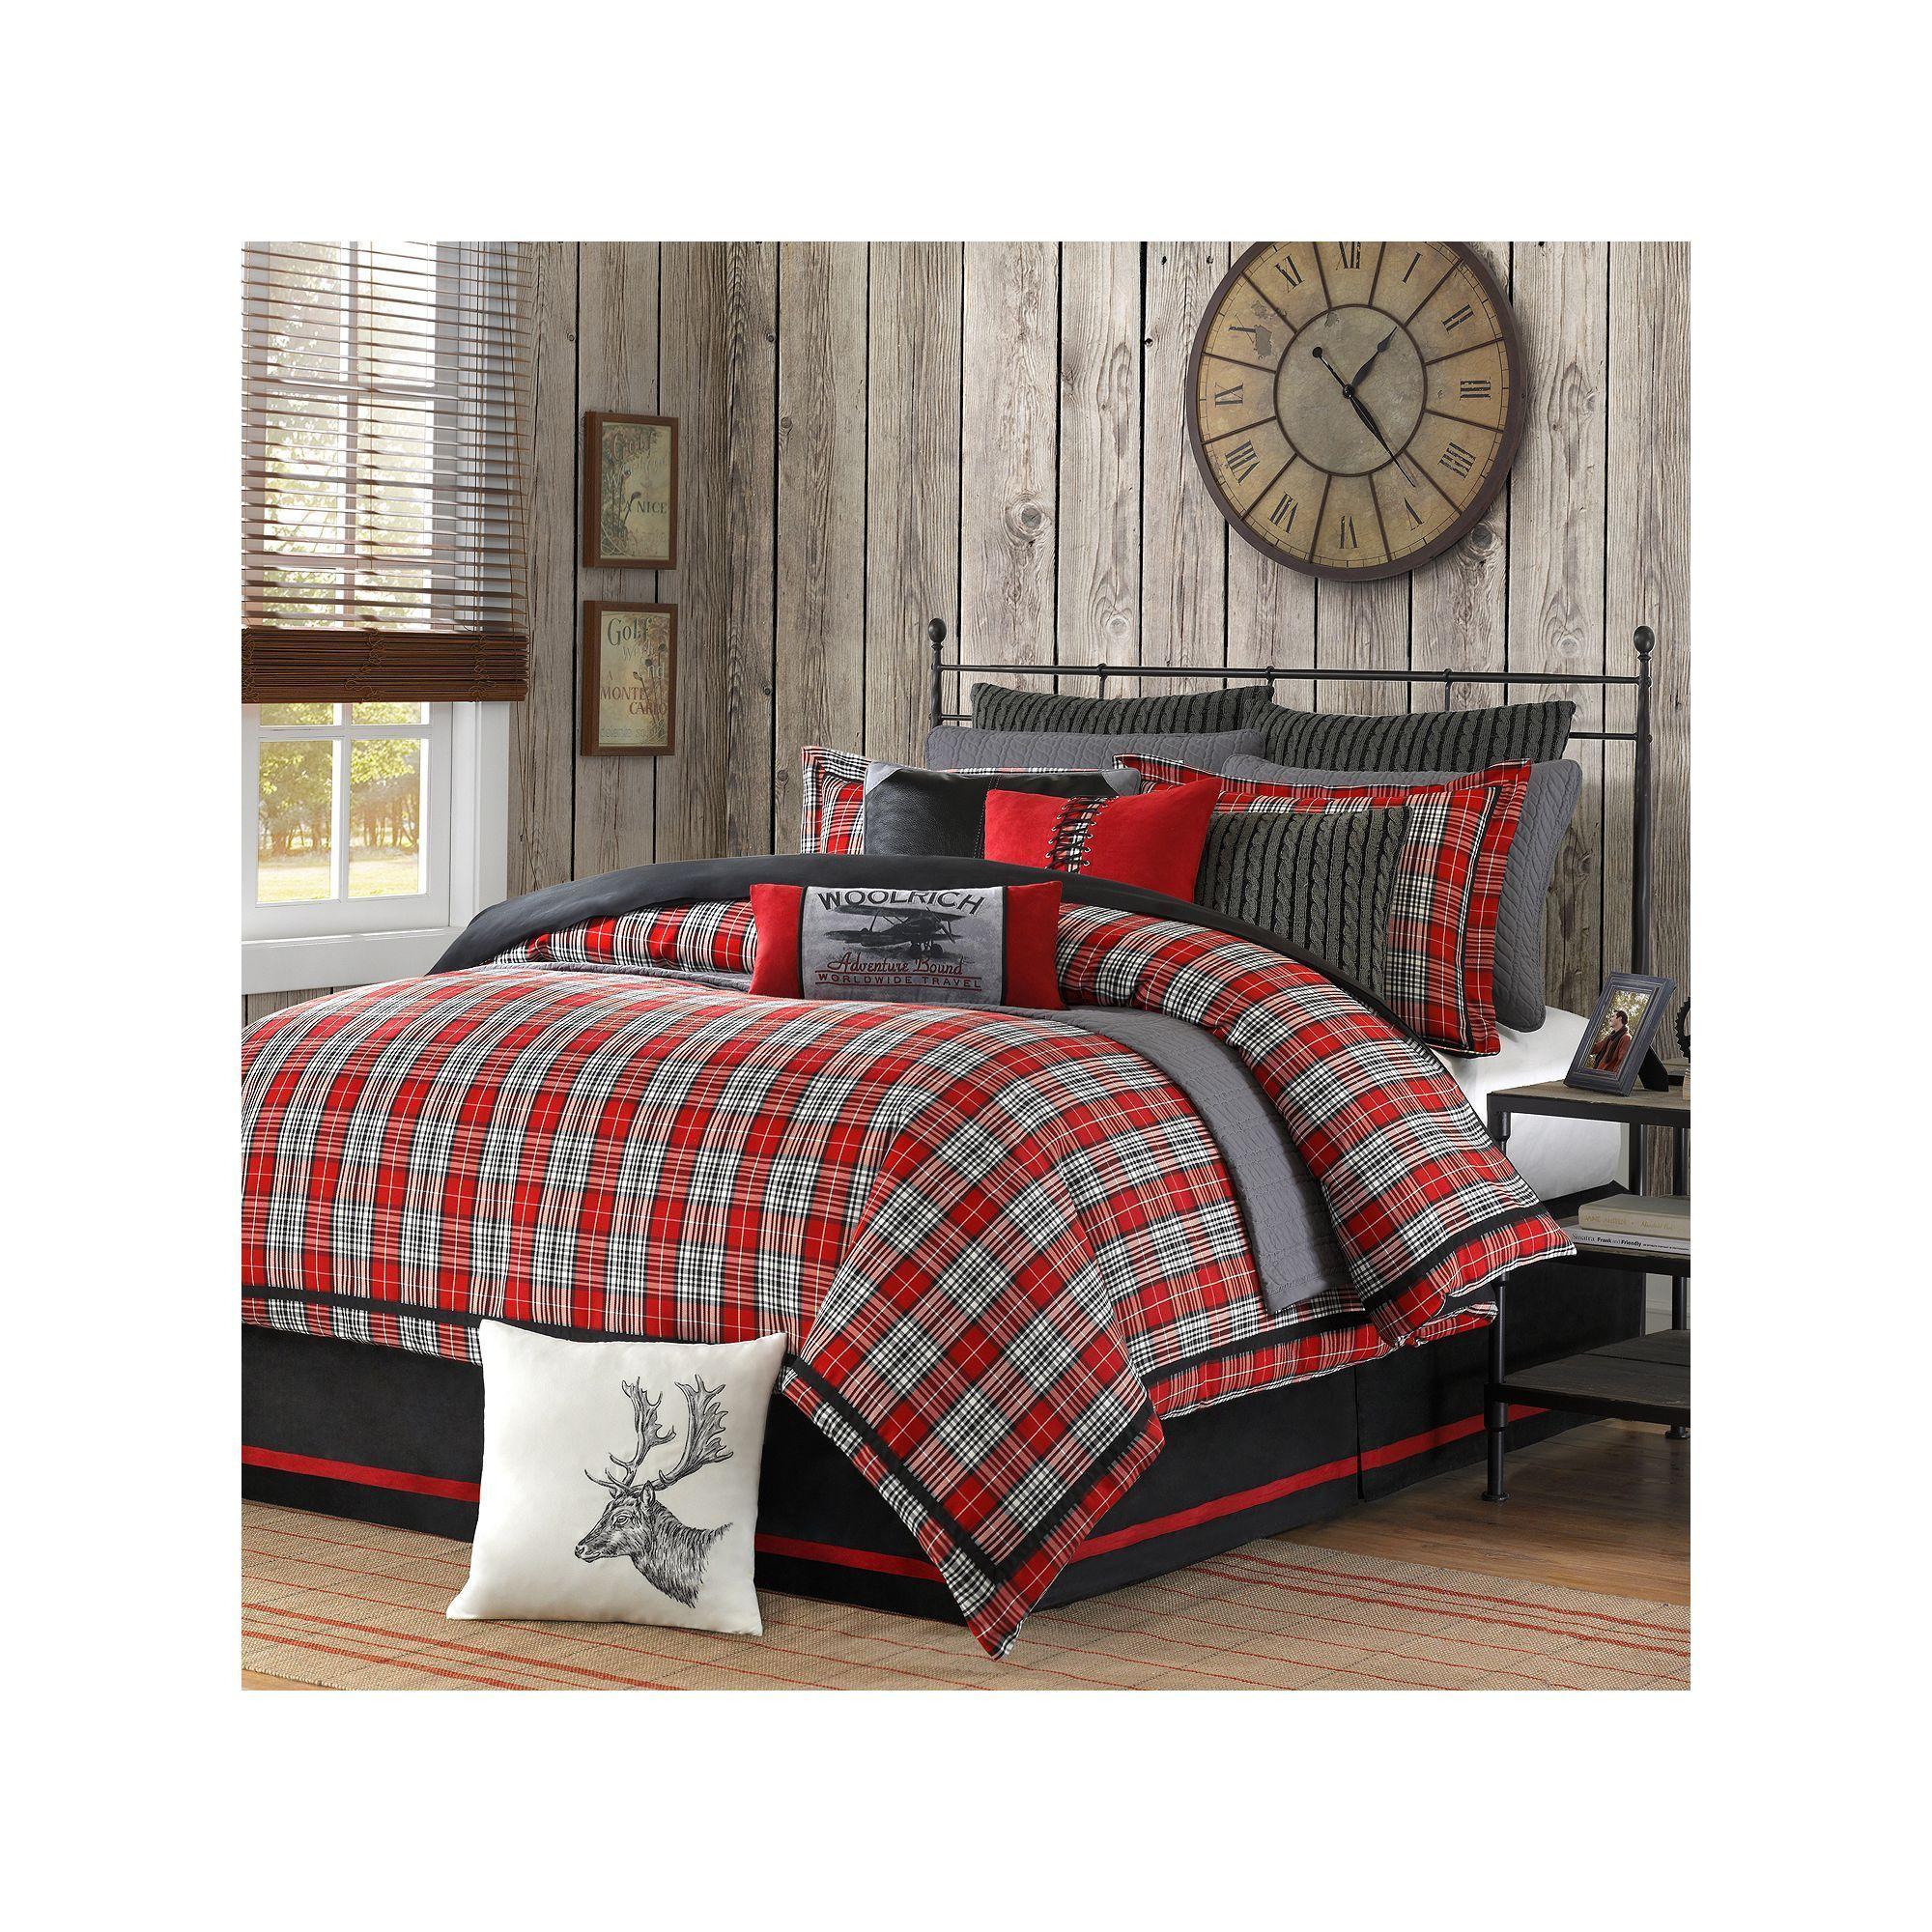 Woolrich Williamsport Comforter Set In